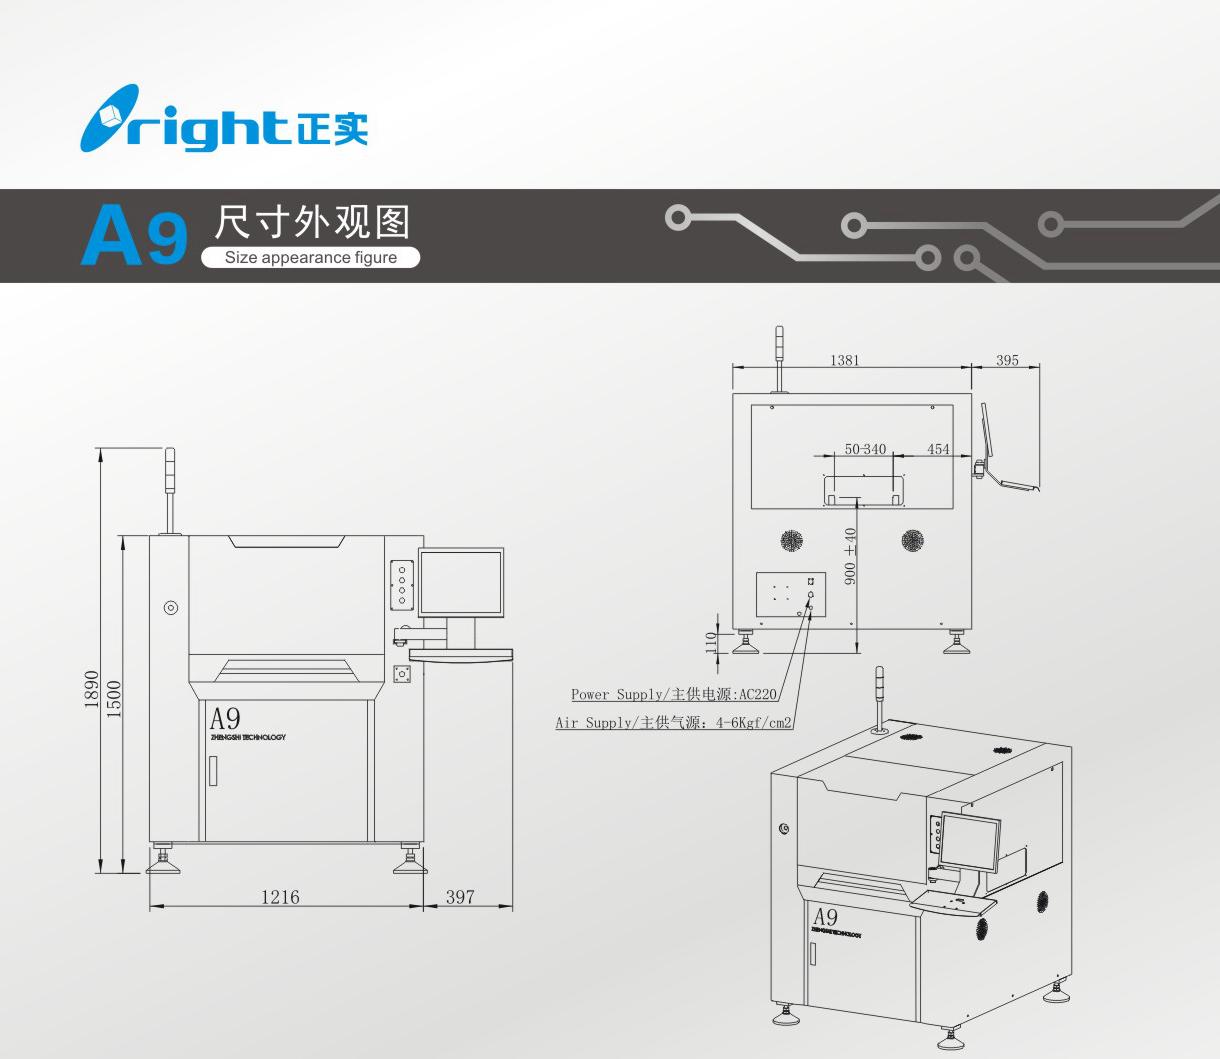 (A9) 机器尺寸.jpg